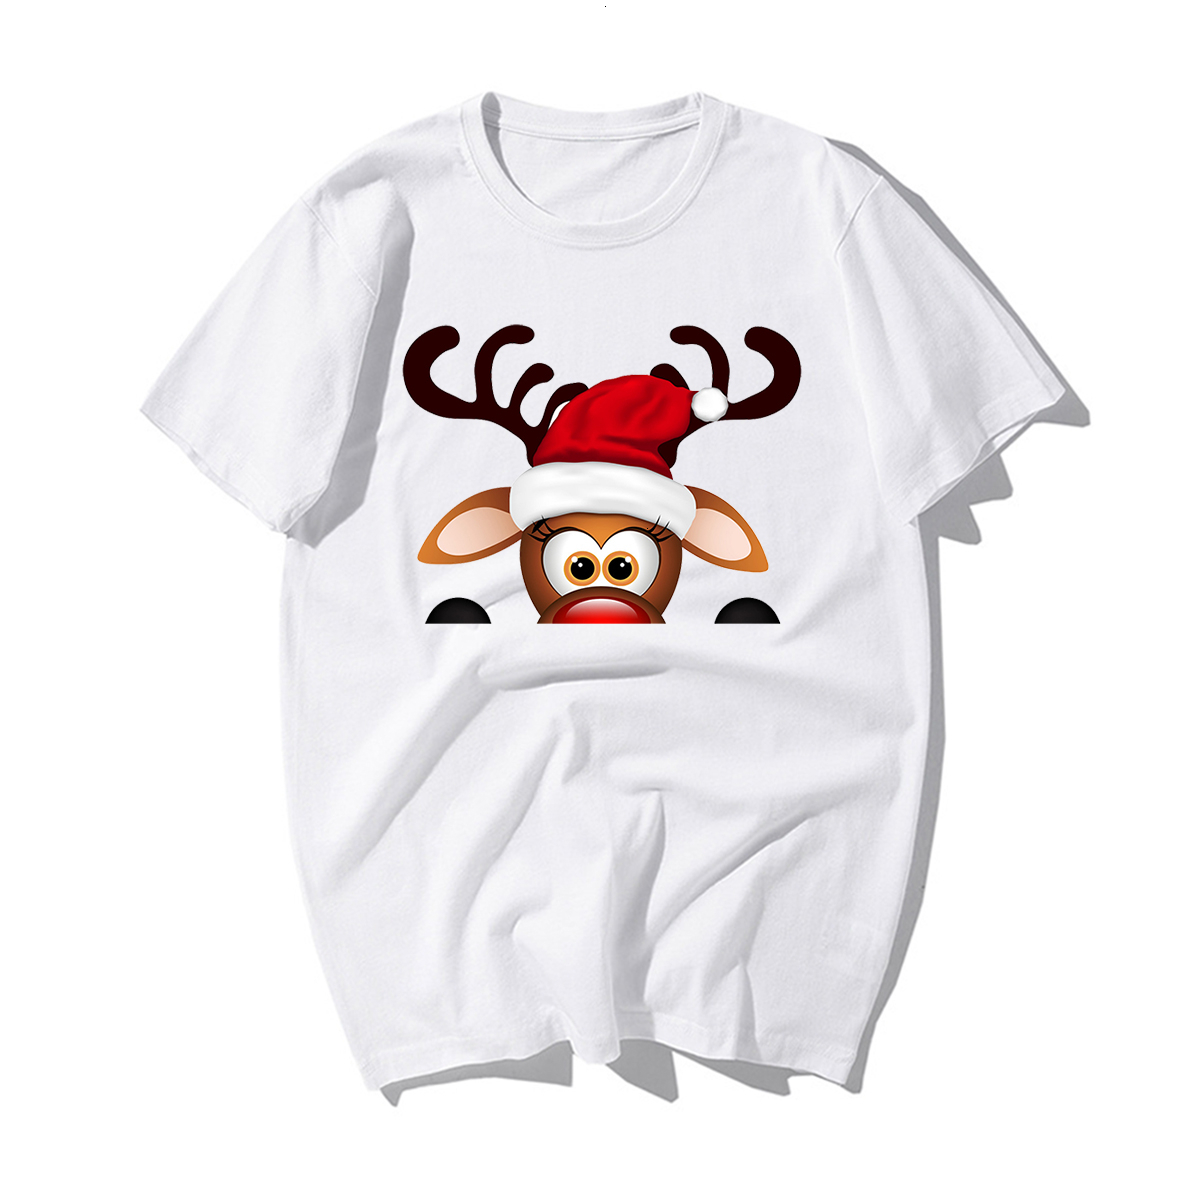 Funny Santa Claus Reindeer Lover CHRISTMAS GIFT T-SHIRT Happy New Year T Shirt Man Tshirt Merry CHRISTMAS Casual Cotton Kawaii 4